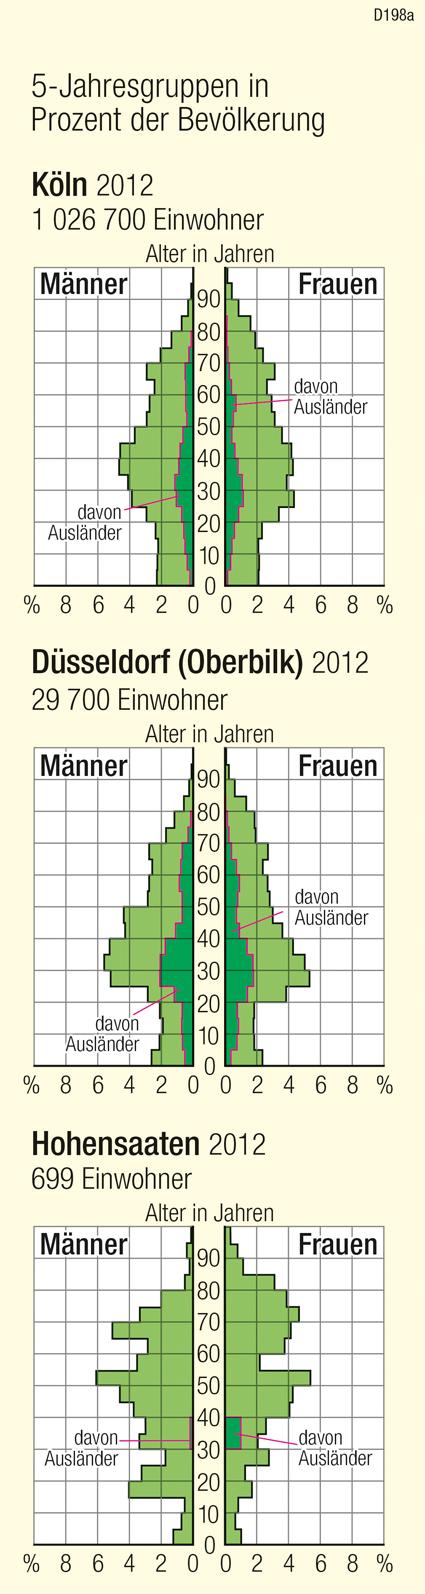 Köln Bevölkerung